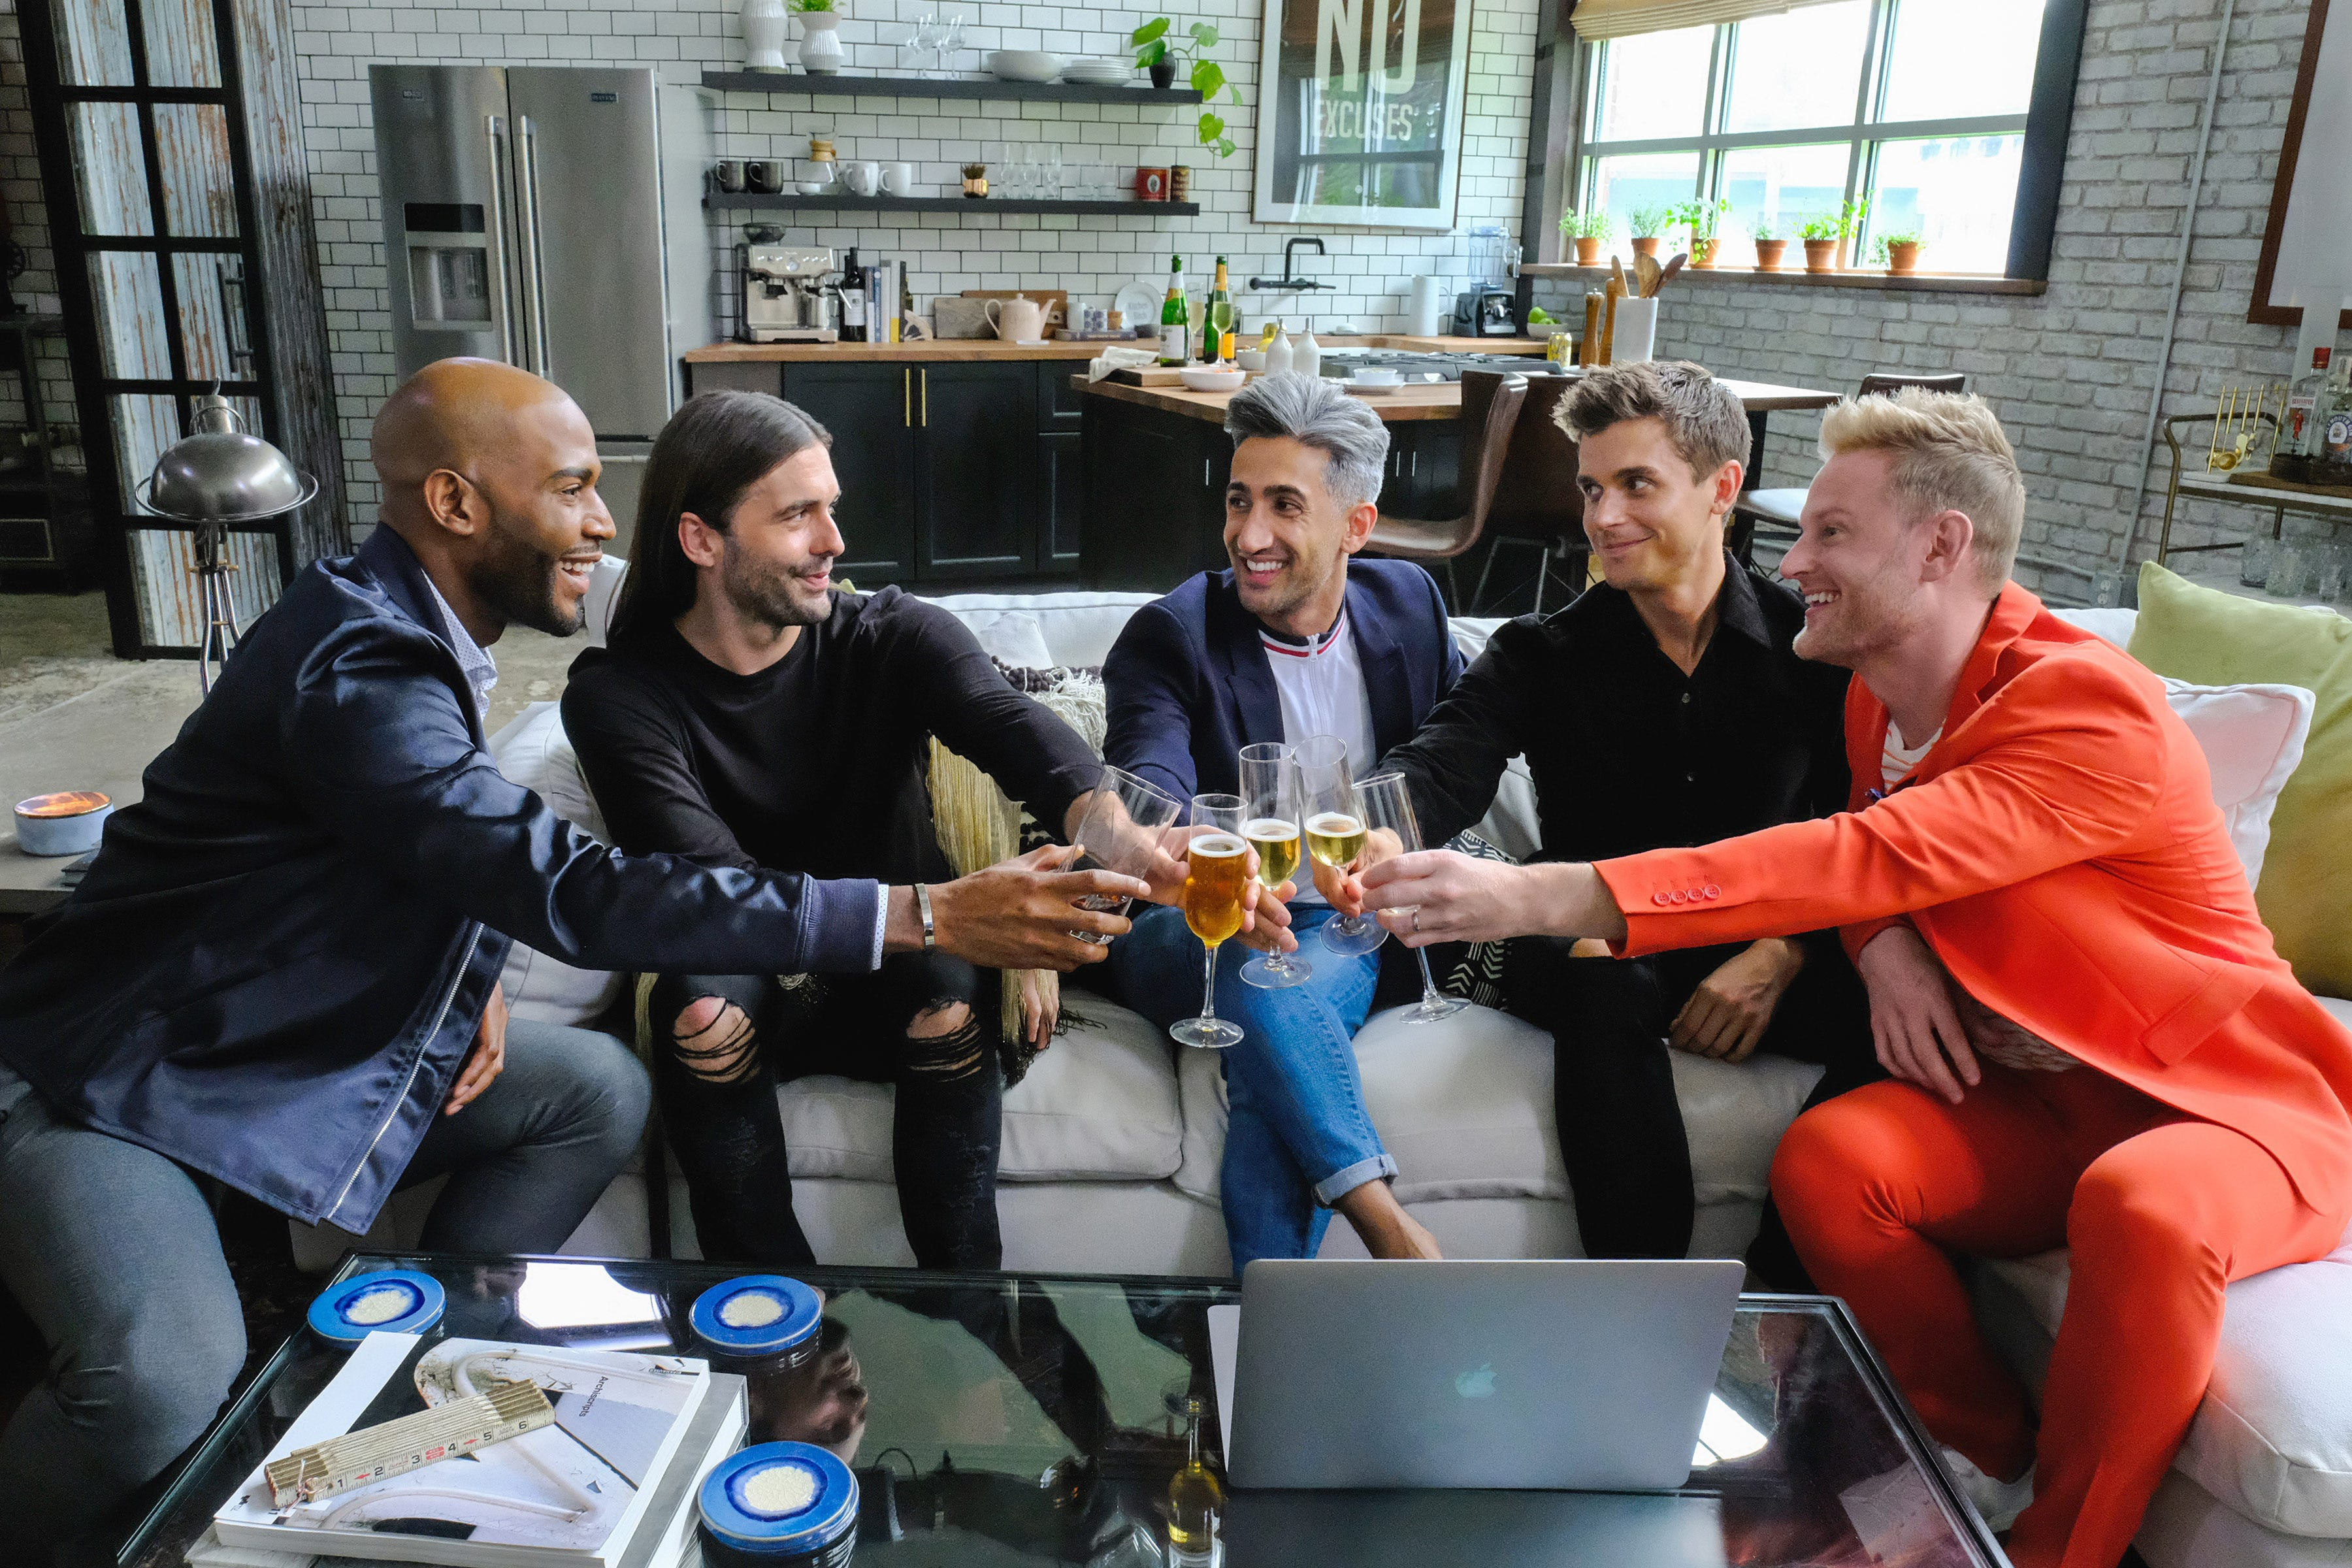 4 gay guys